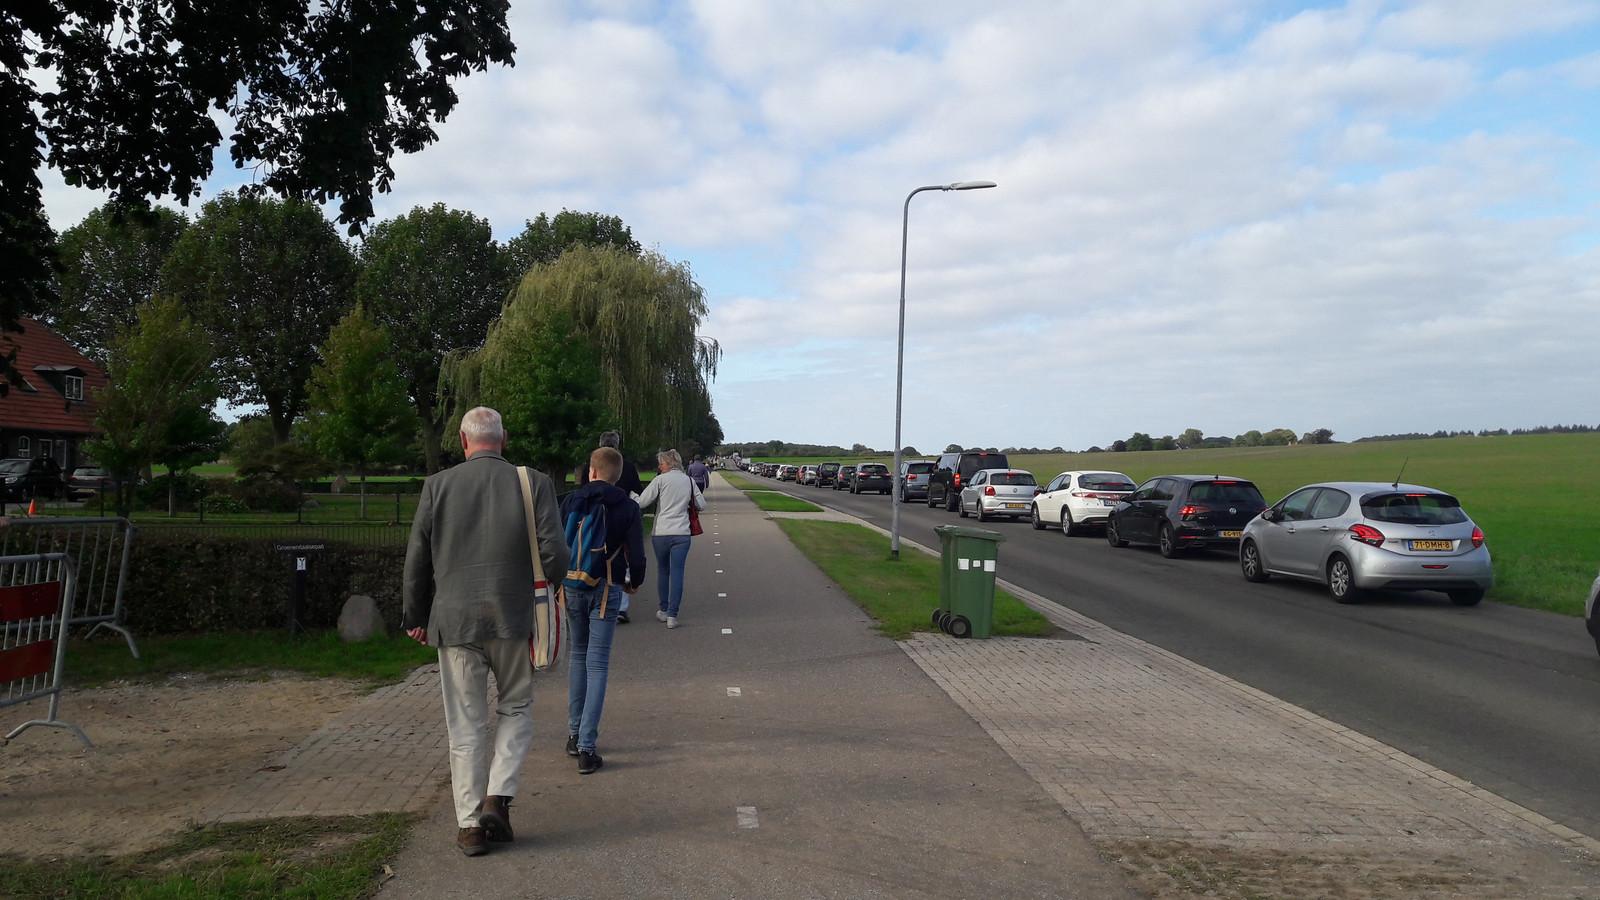 Files op de Wylerbaan in Groesbeek.